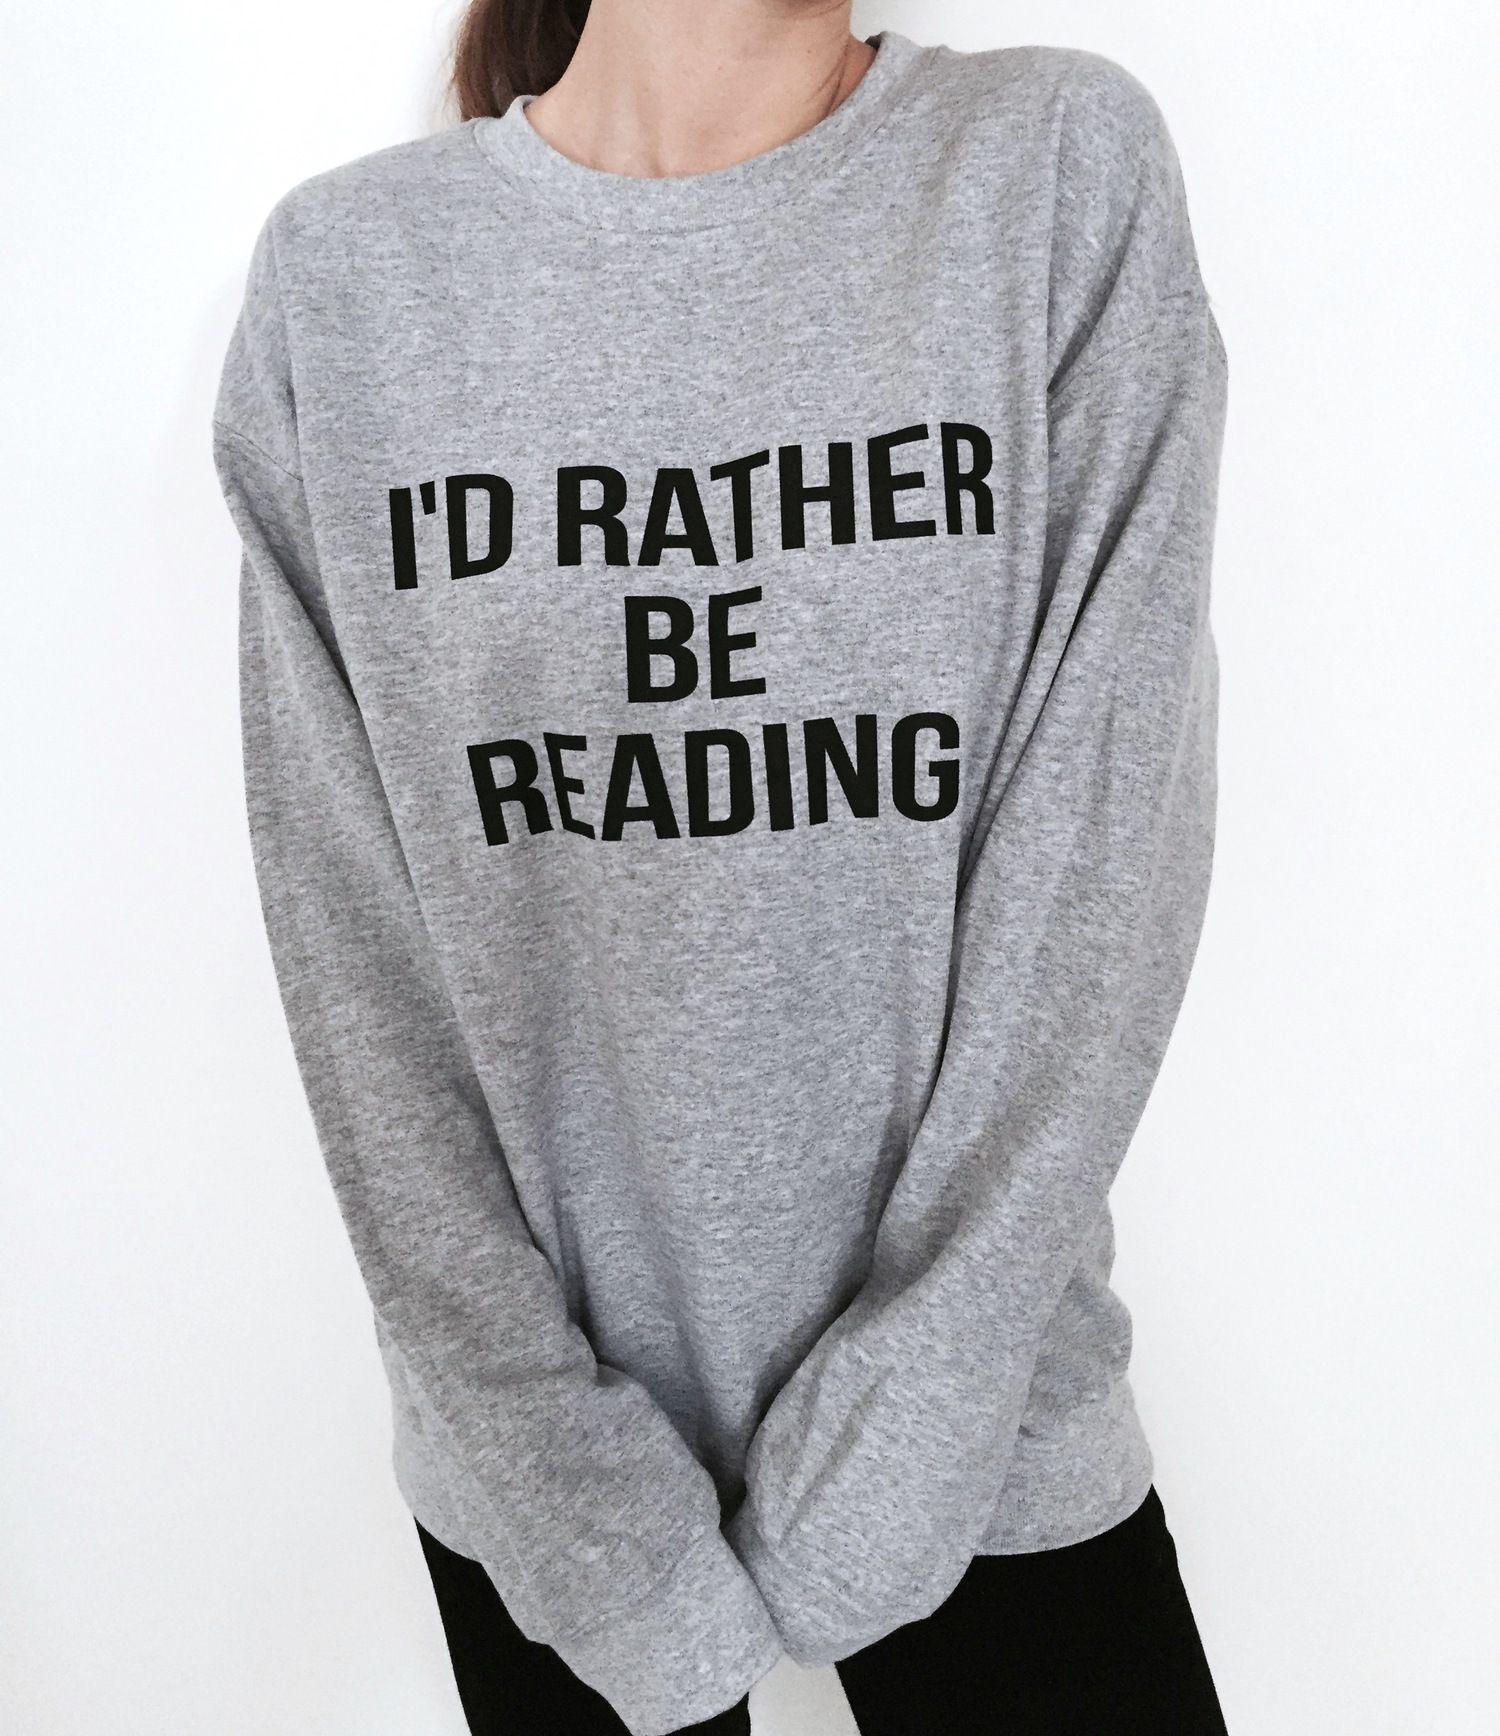 Sweatshirts Jumper Sweater Funny Fashion Cute Hipster Geek Nerd